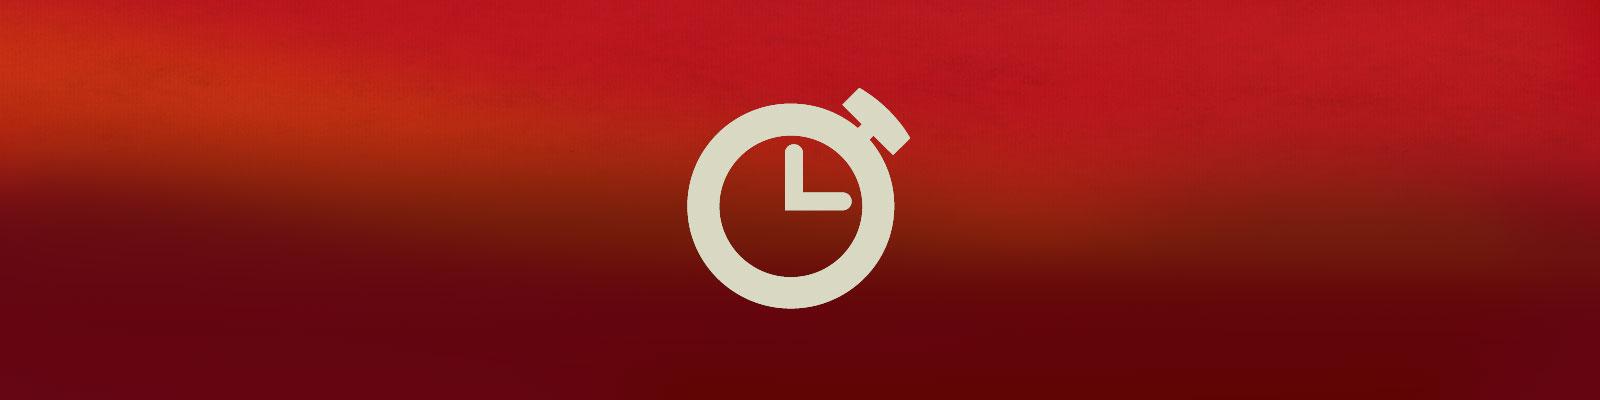 Durrow Gym - Class Times